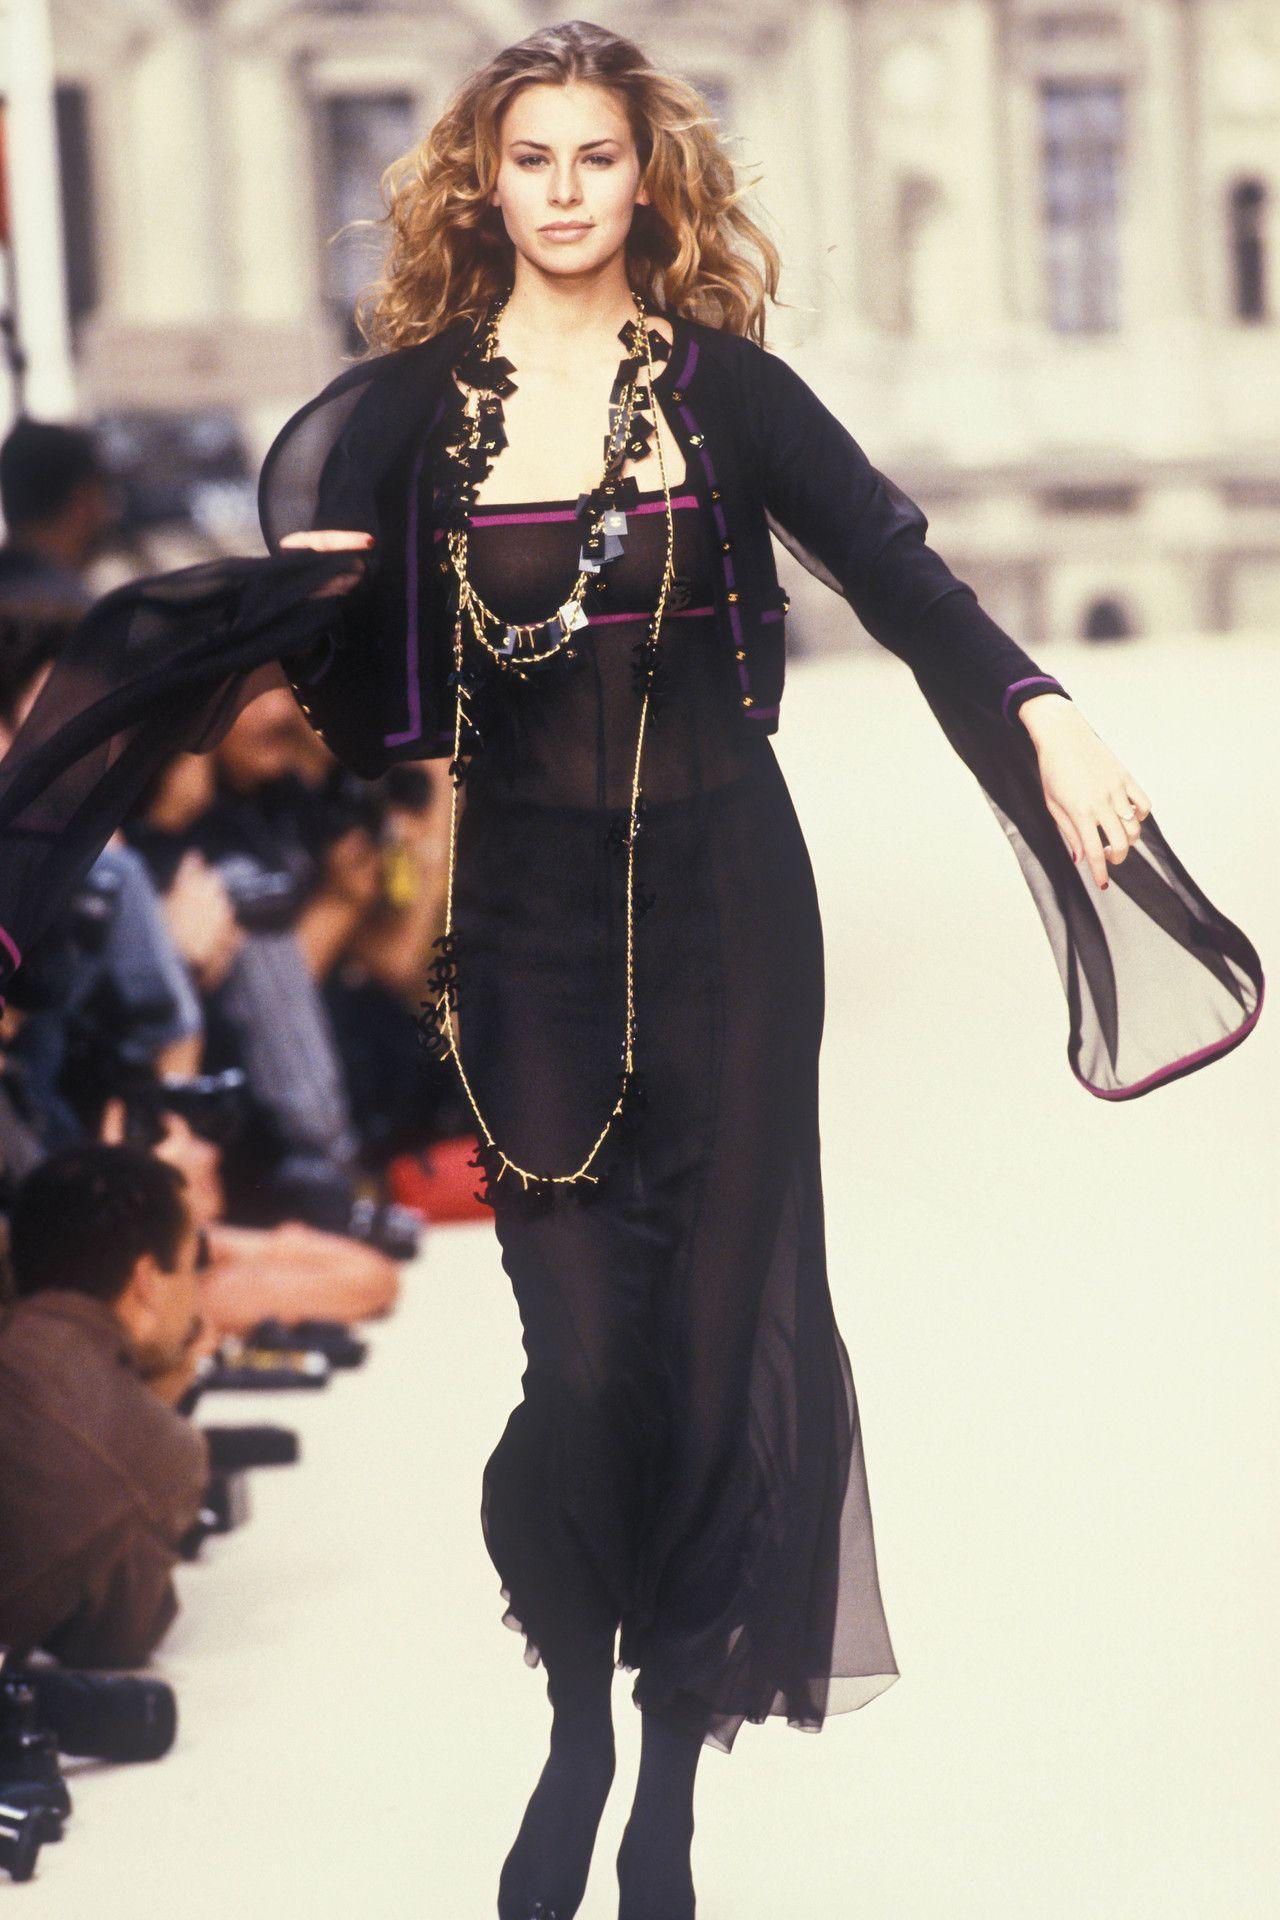 Anine Bing Timeless Fashion in 2021 | Fashion